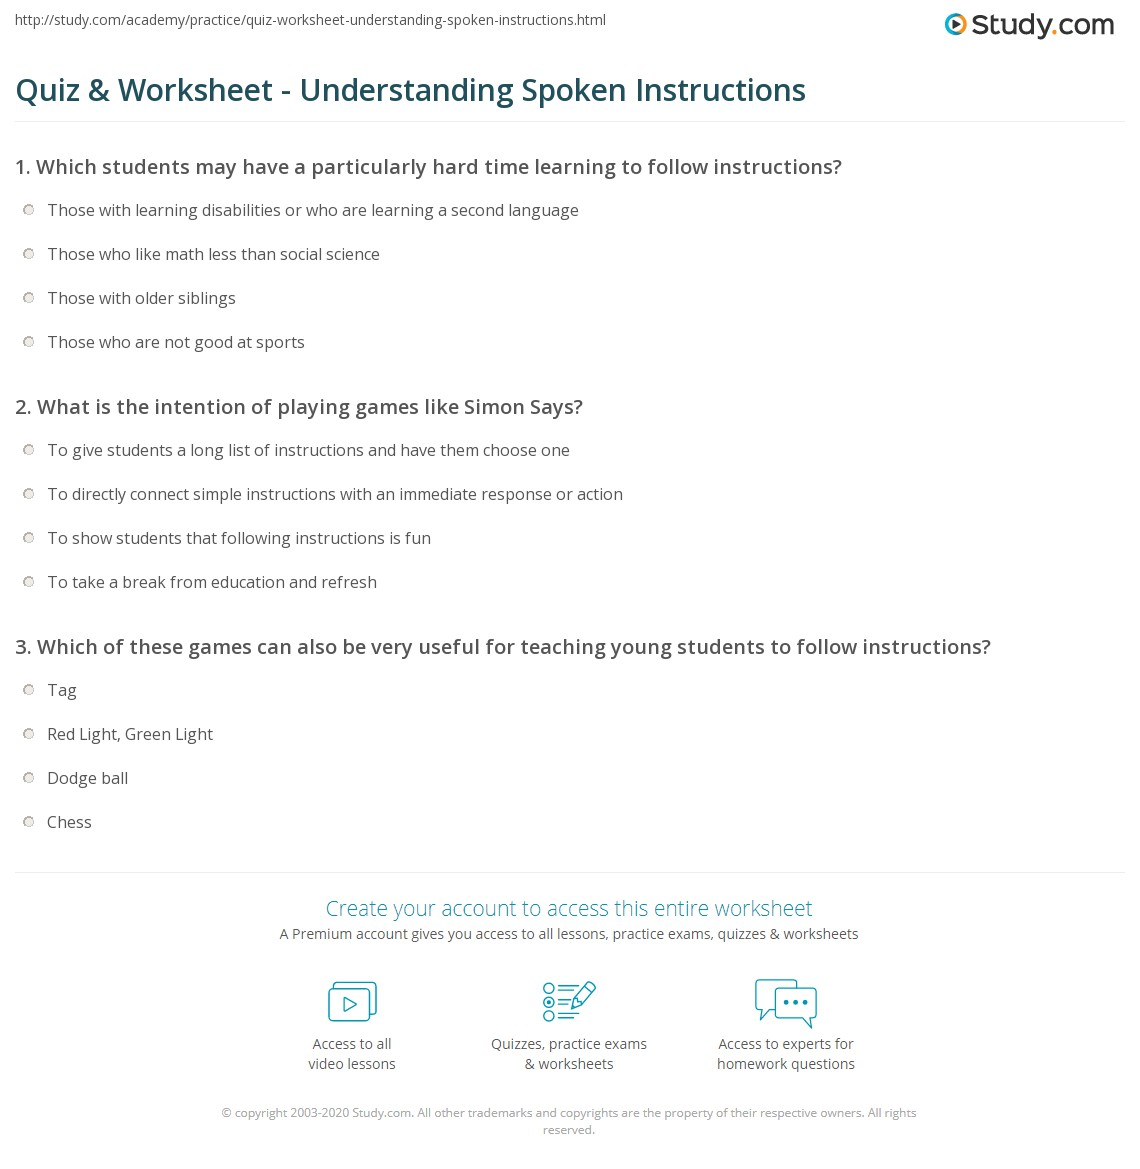 Worksheets Following Directions Worksheet Middle School worksheet following directions middle school quiz understanding spoken instructions study com print listenin